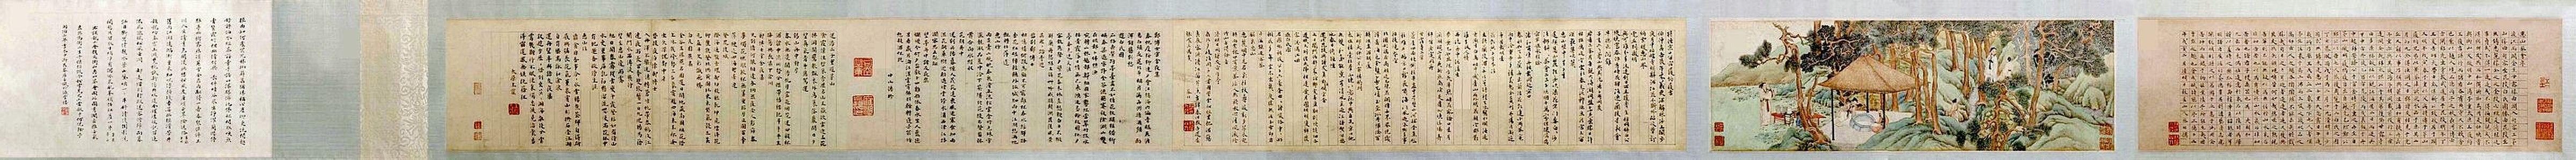 History Of Tea Wikipedia